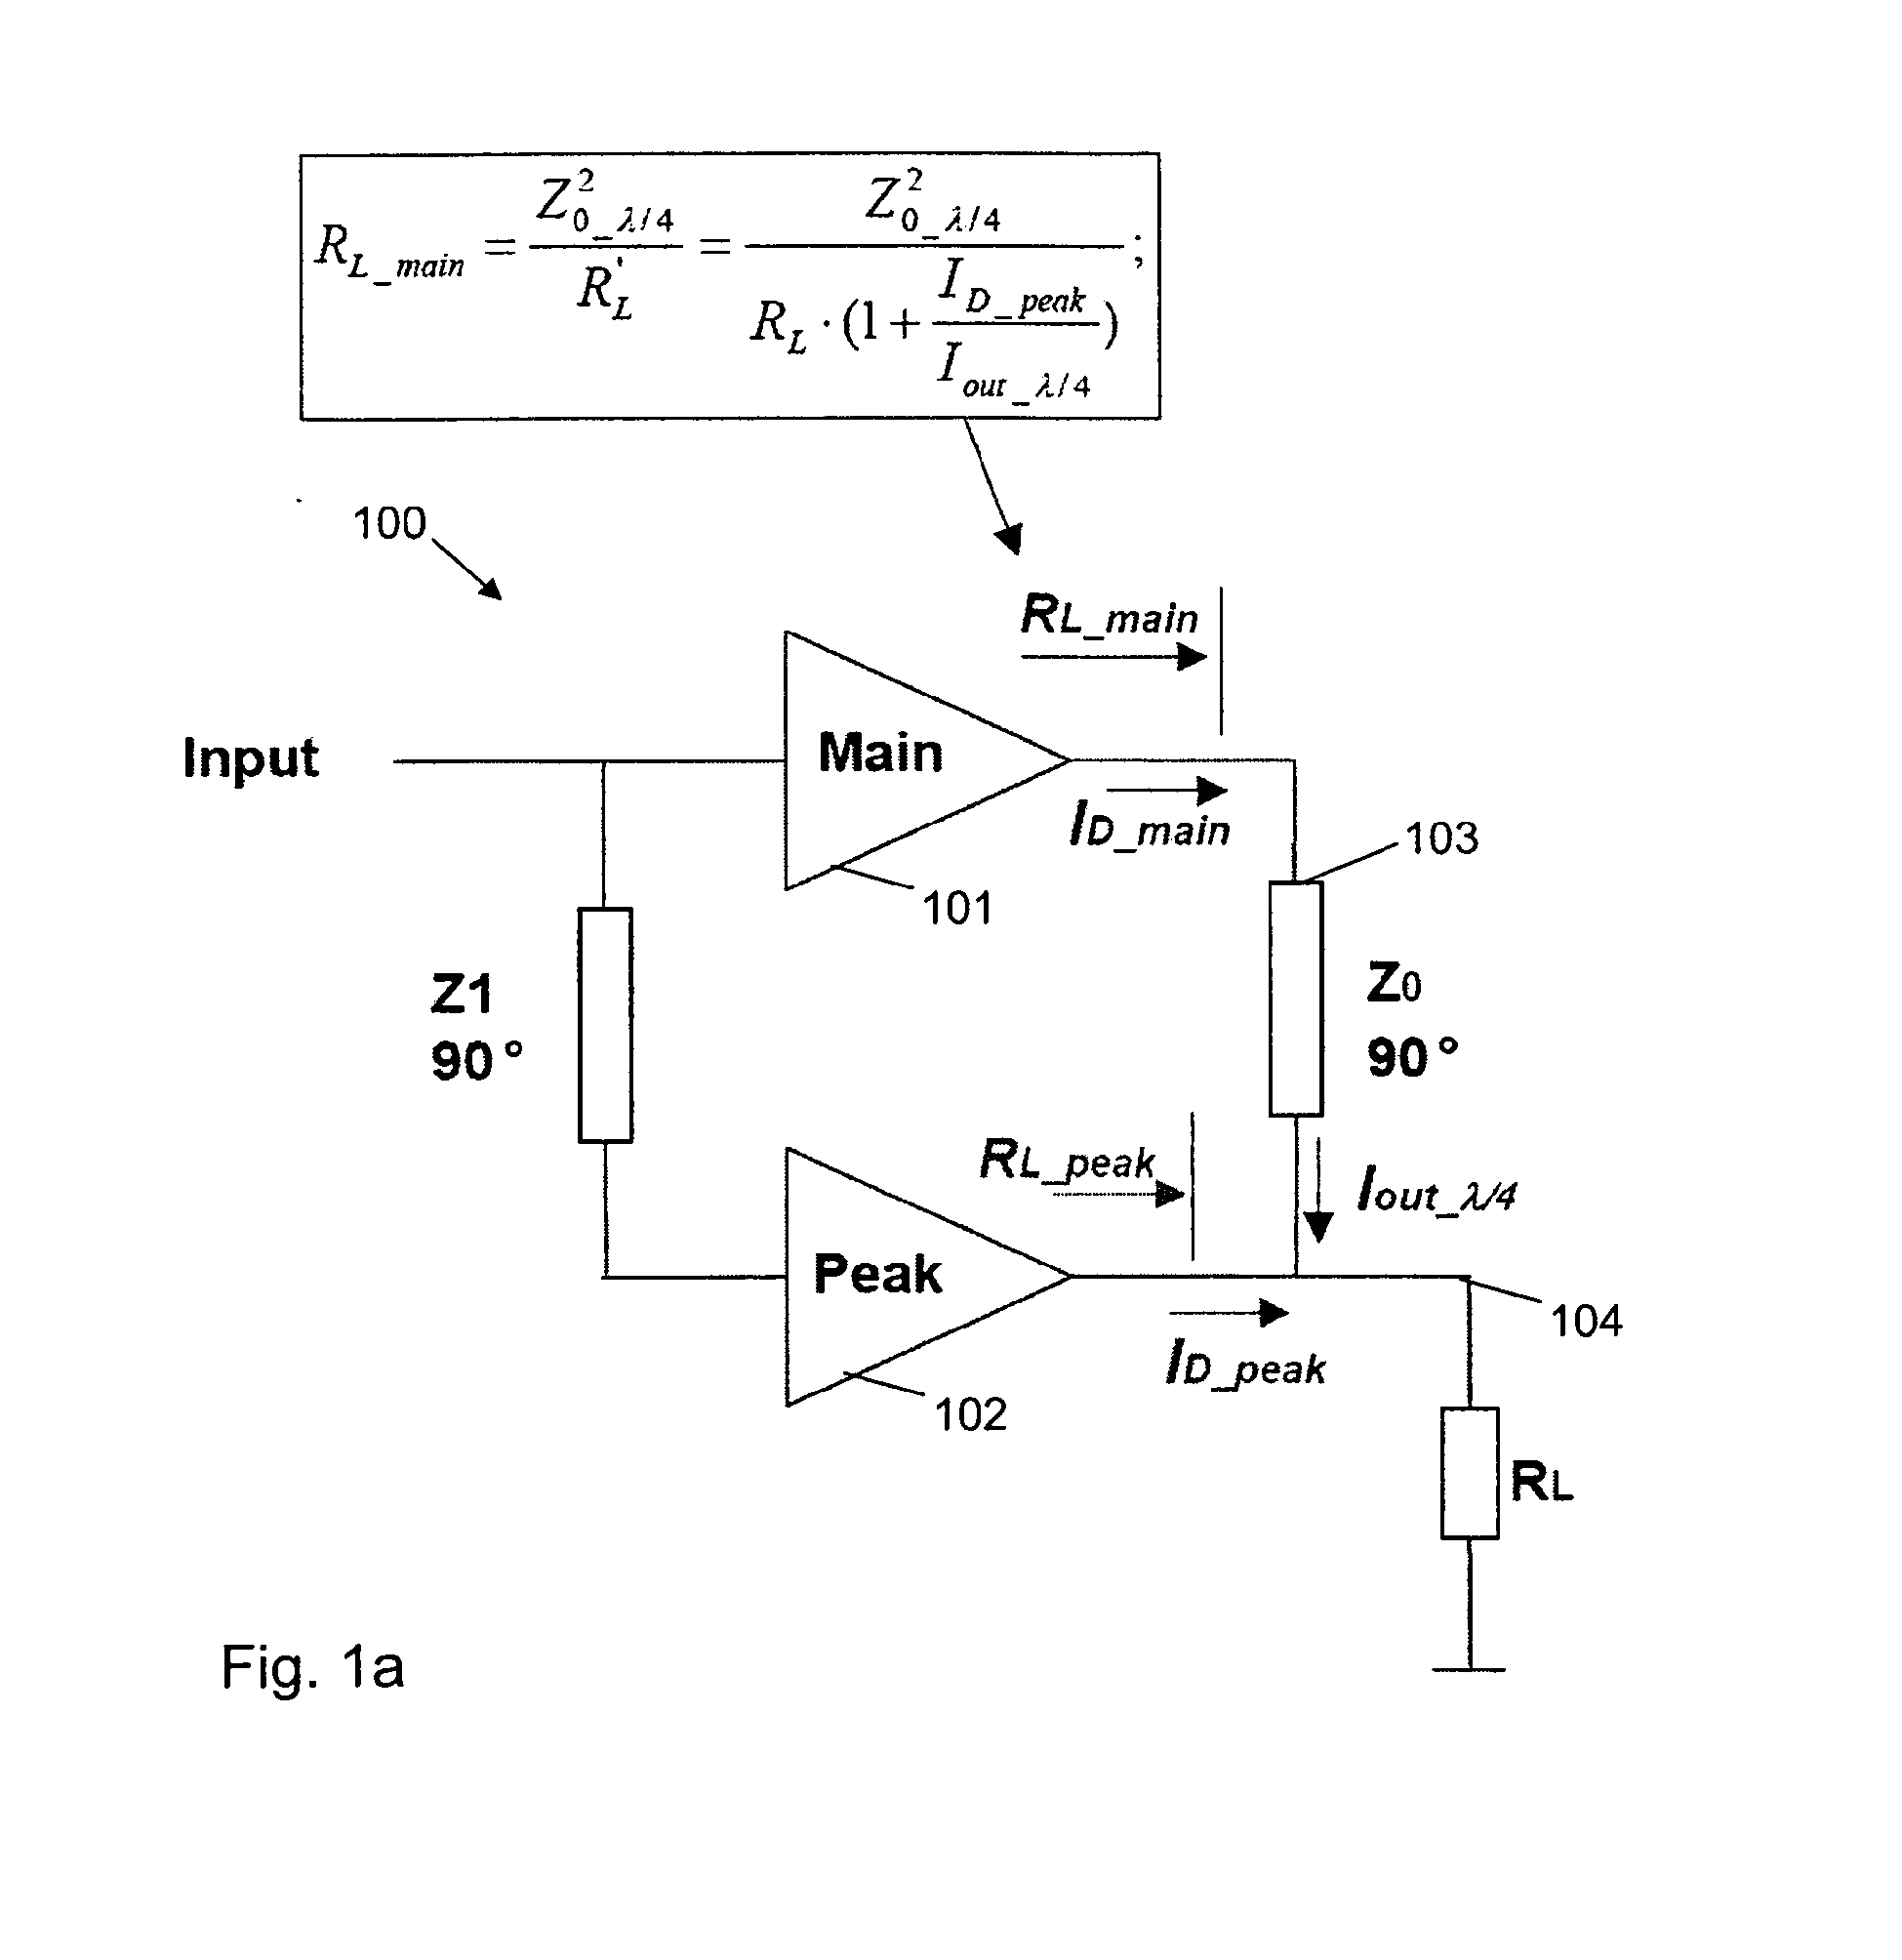 Doherty Power Amplifier Phd Thesis Class C Circuit Diagram High Efficiency Design Using